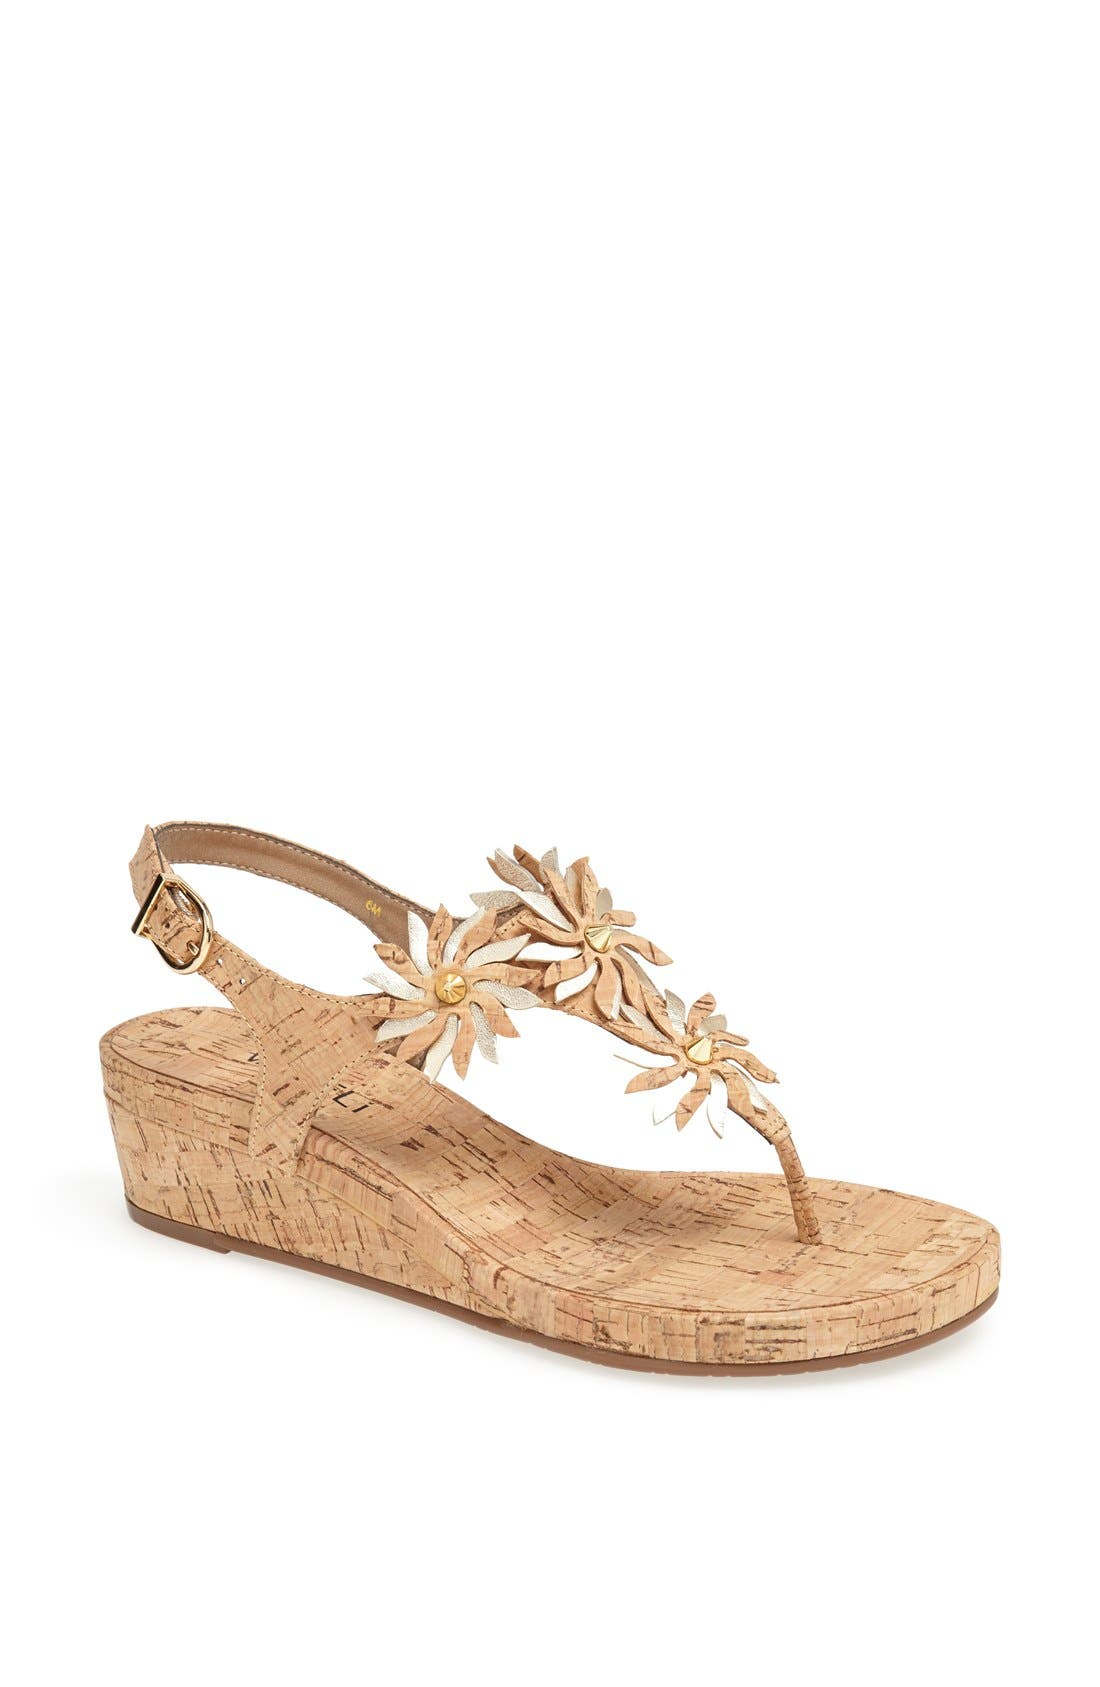 Main Image - VANELi 'Kenan' Wedge Thong Sandal